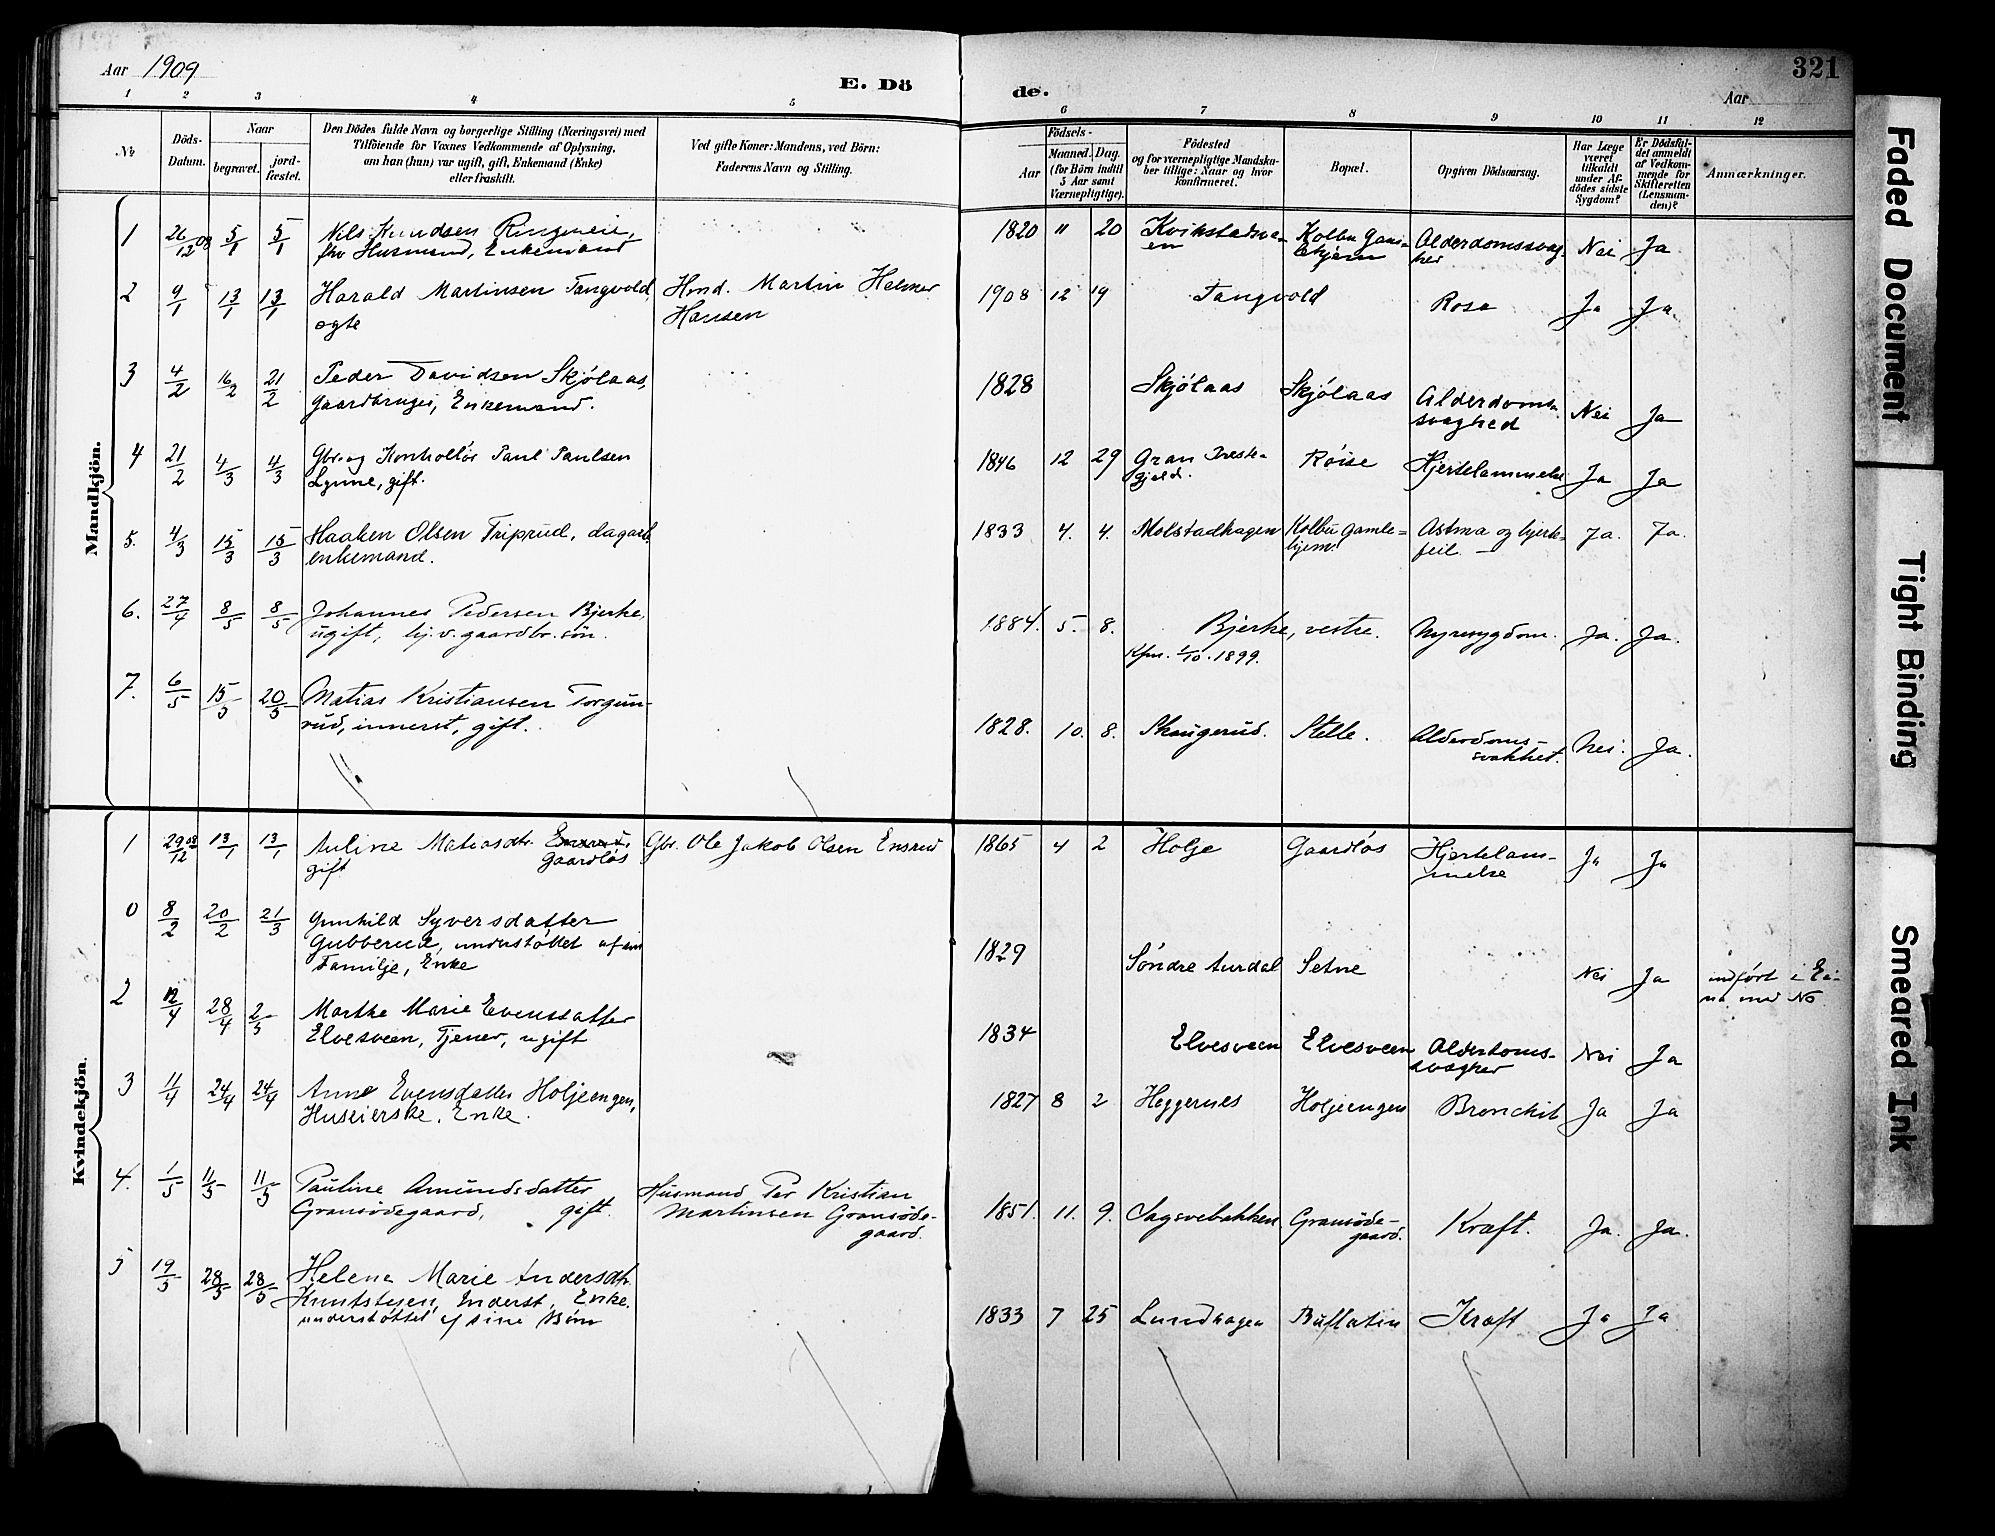 SAH, Vestre Toten prestekontor, H/Ha/Haa/L0013: Ministerialbok nr. 13, 1895-1911, s. 321